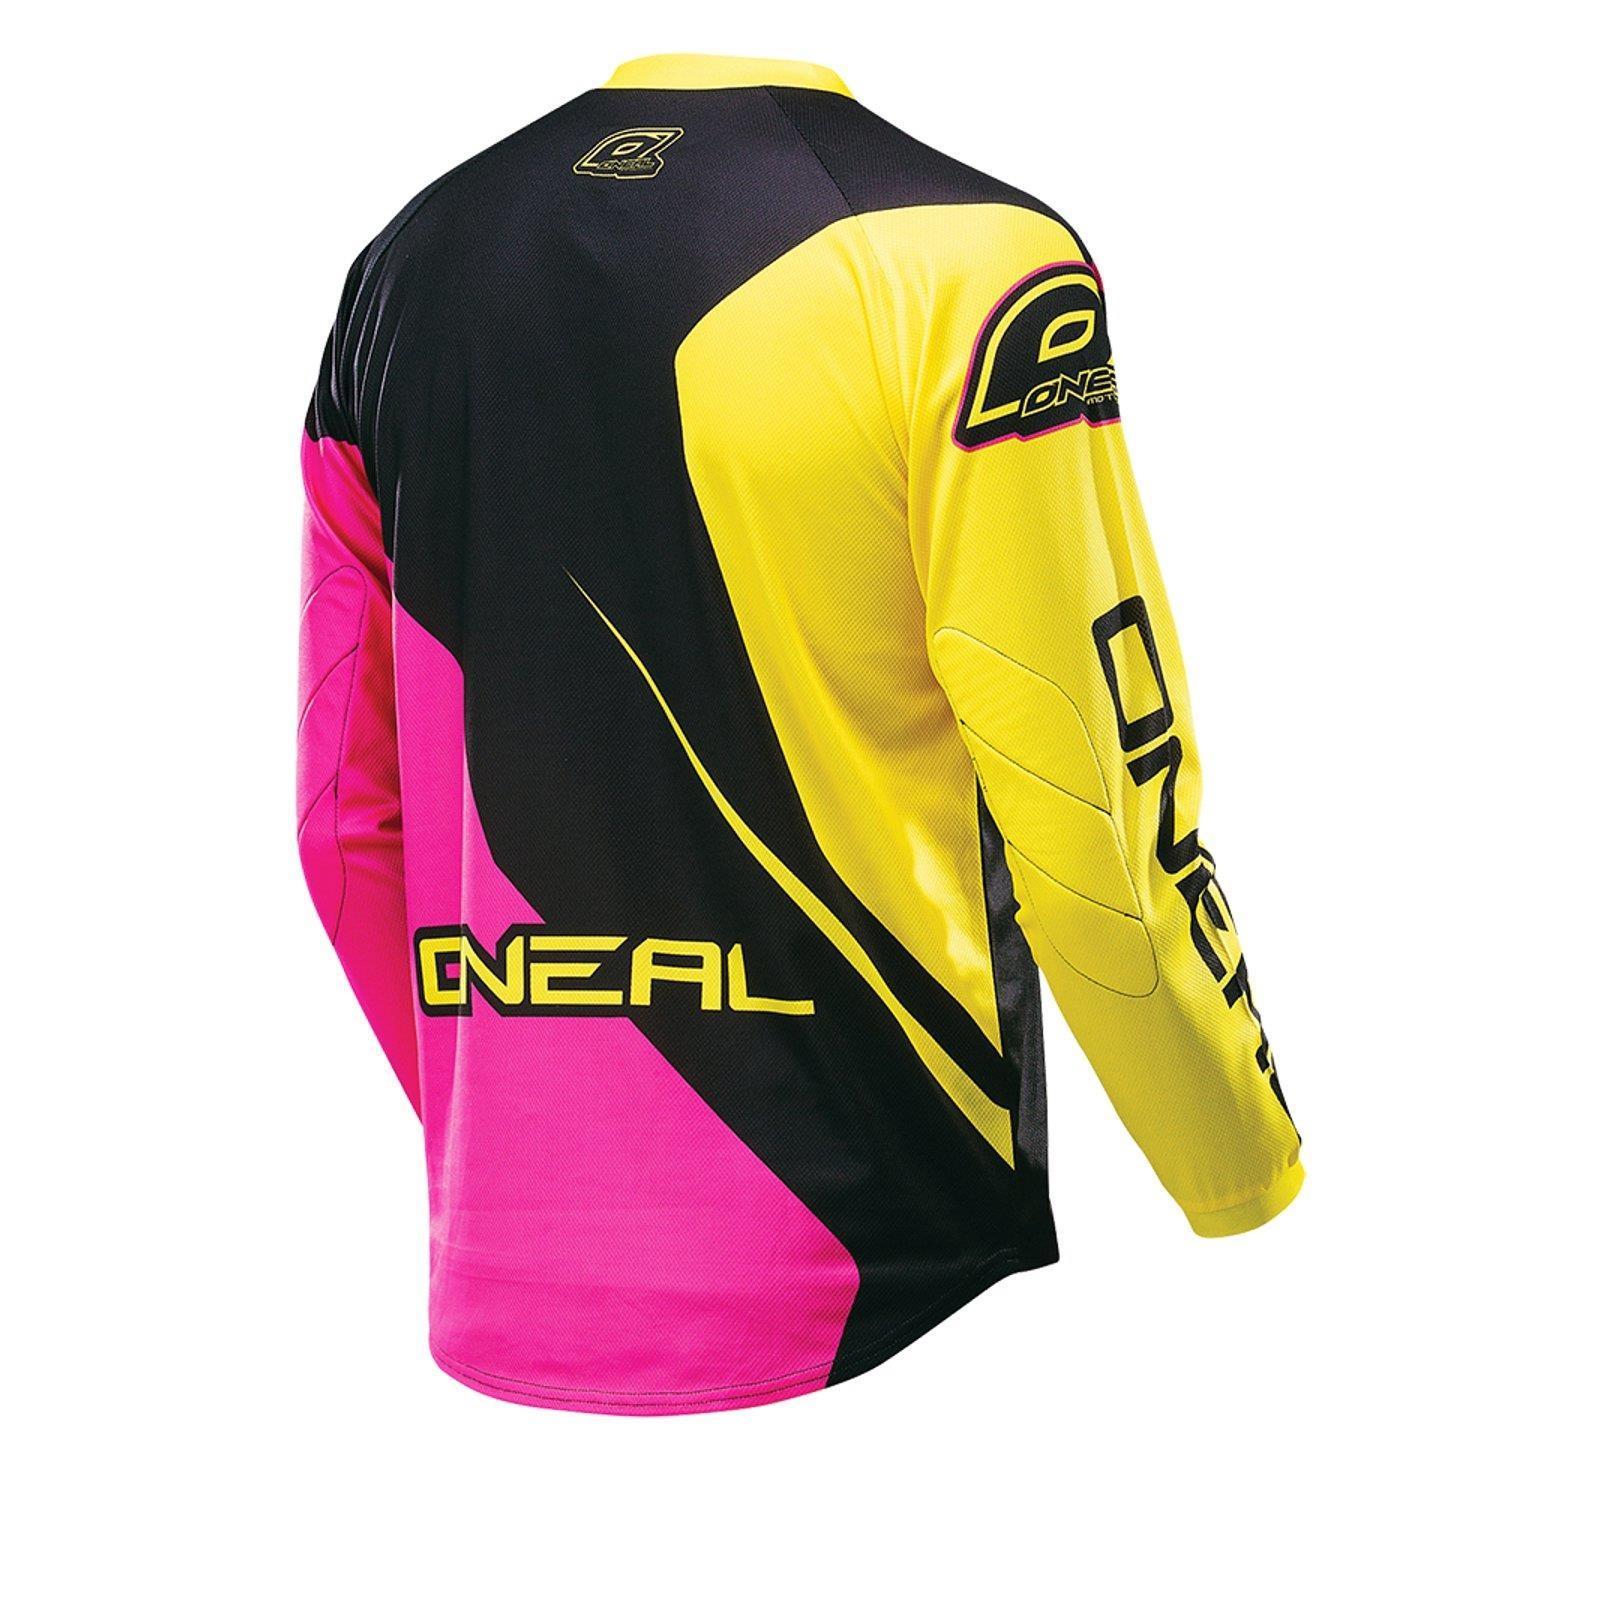 O-039-Neal-elemento-Mayhem-JERSEY-Racewear-Motocross-Maglia-MX-DH-FR-MTB-MOUNTAIN-BIKE miniatura 102